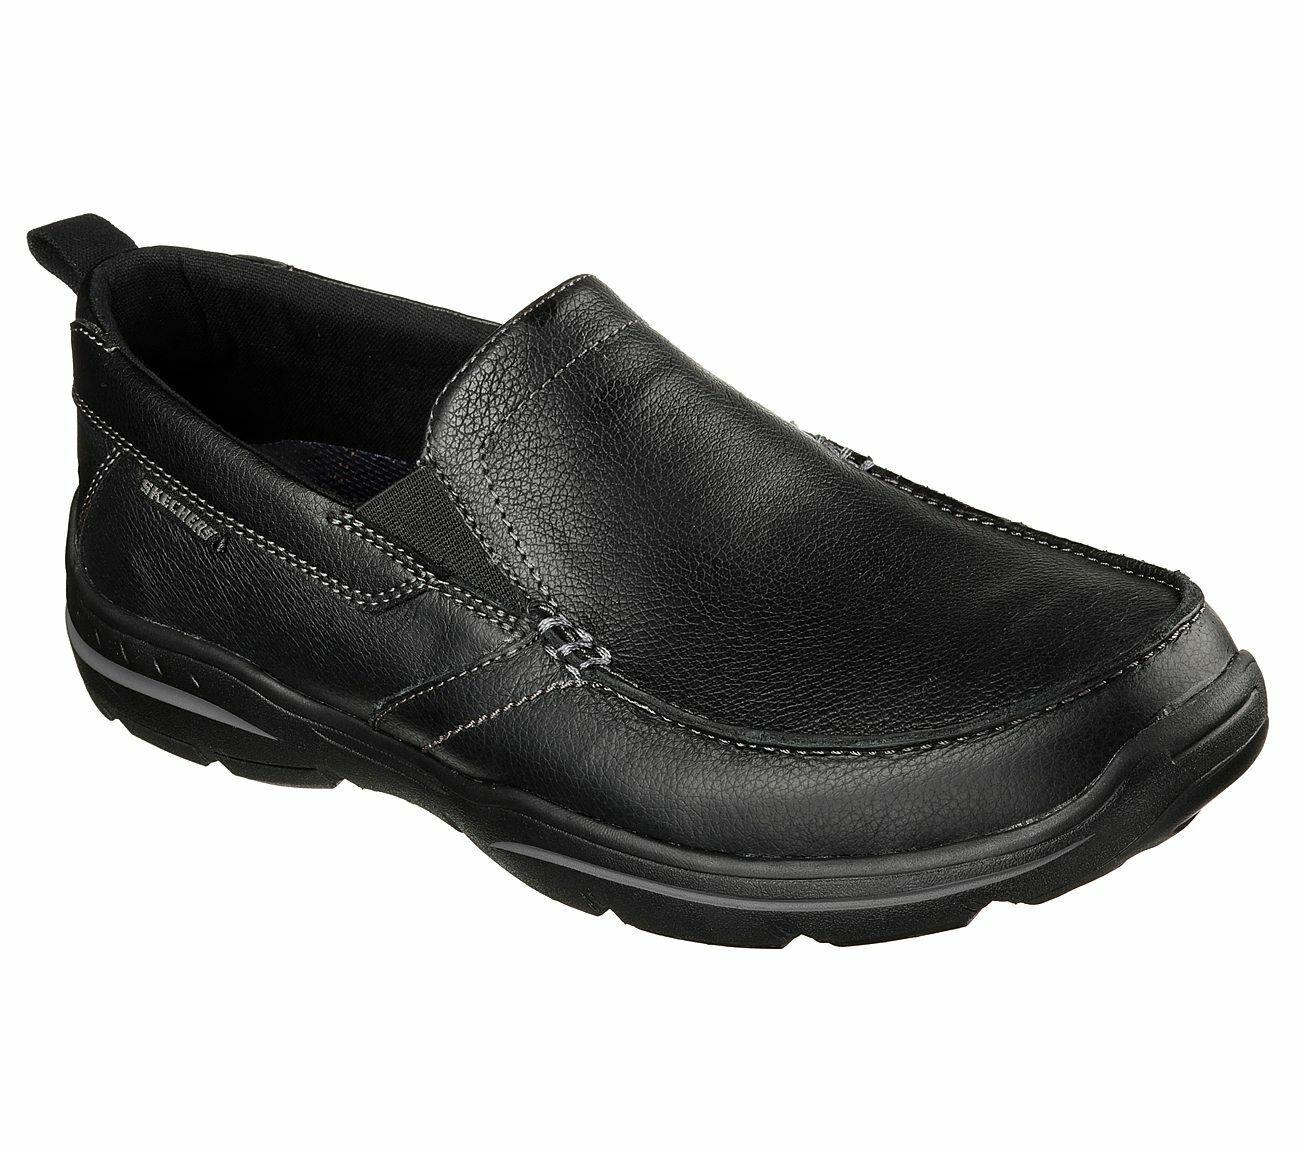 Skechers Men's Relaxed Fit  Harper Forde Leather Loafer shoes. 64858 BLK